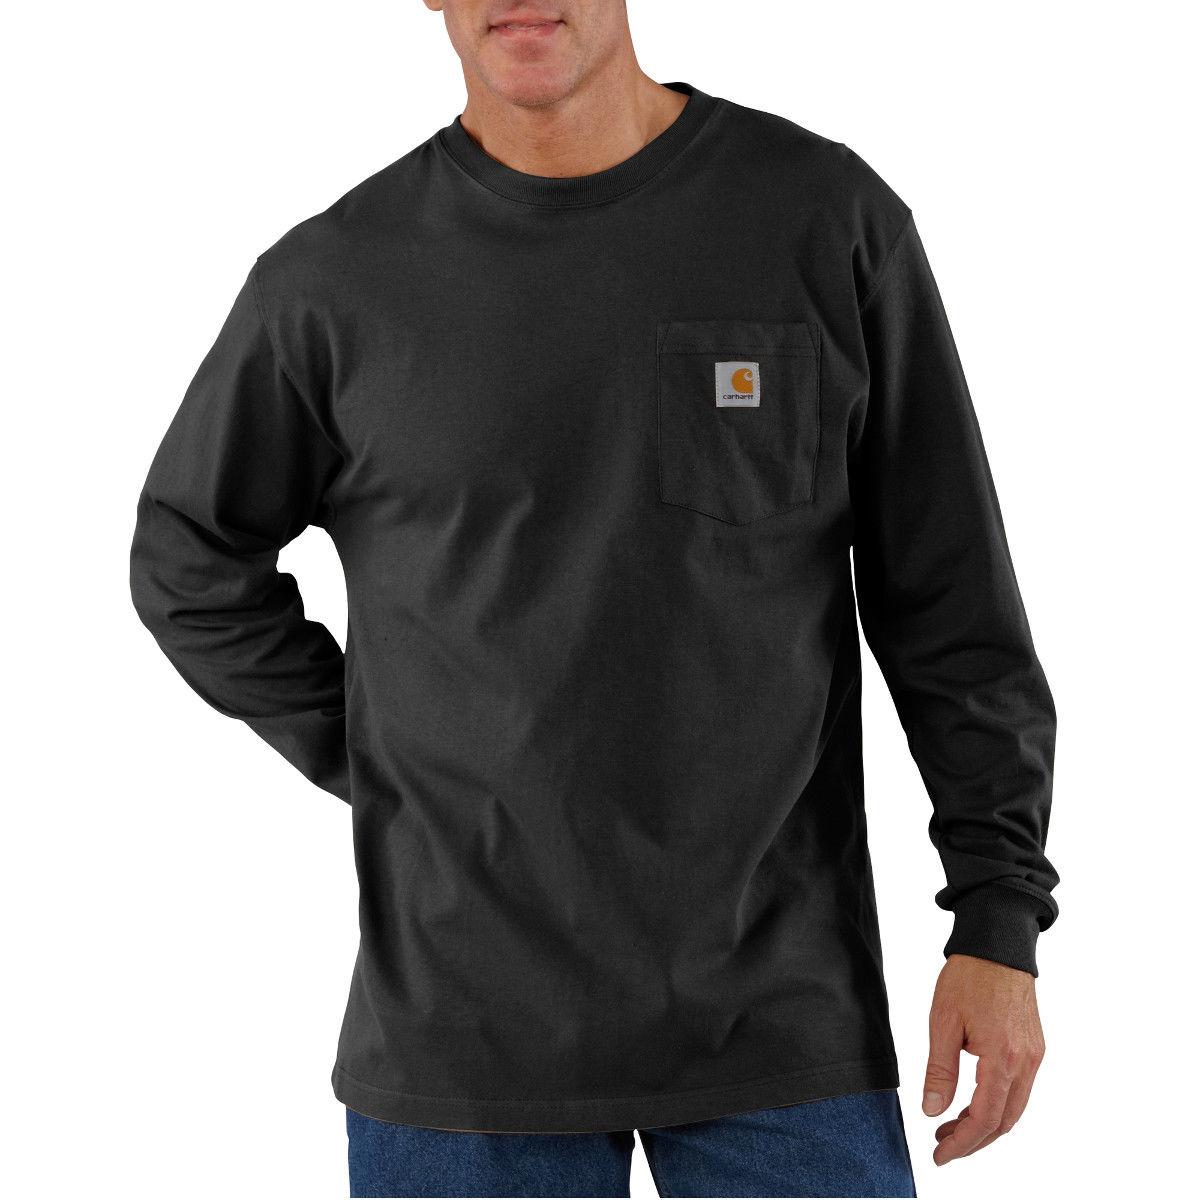 Carhartt Men's Workwear Pocket Long-Sleeve Tee - Black, 3XL